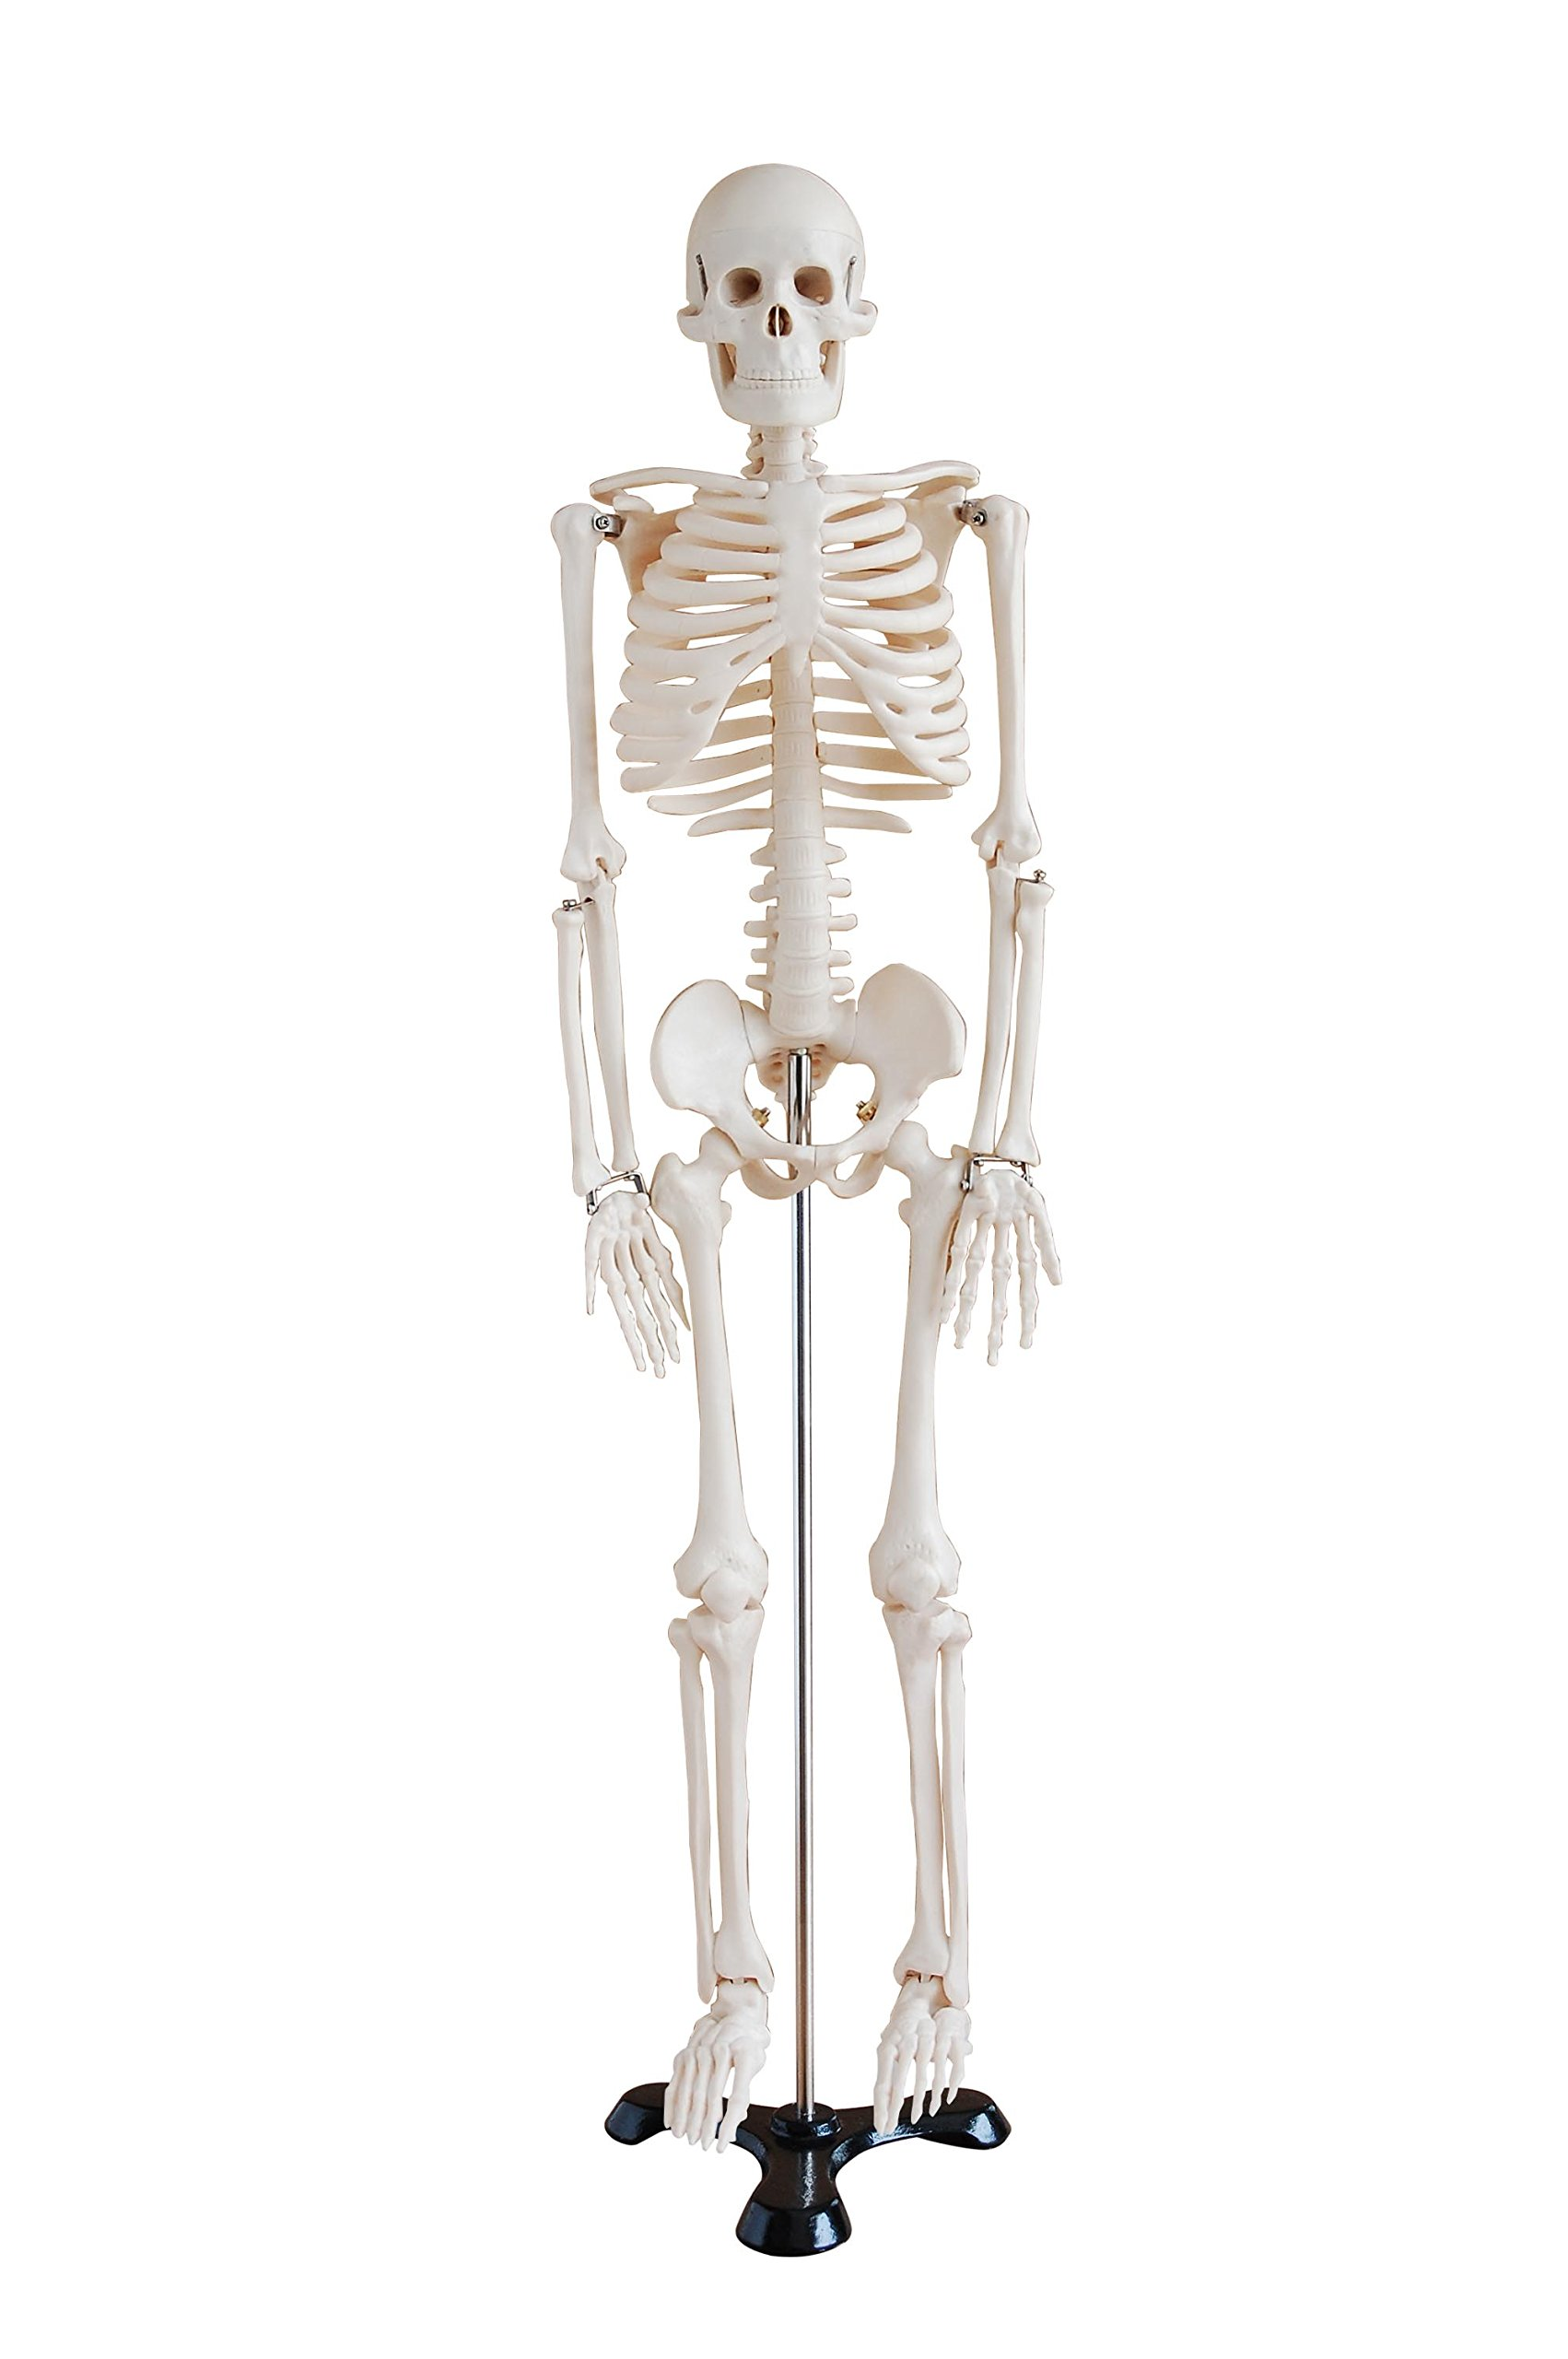 Mini Human Skeleton Model 1/2 Life Size on Metal Base 85cm